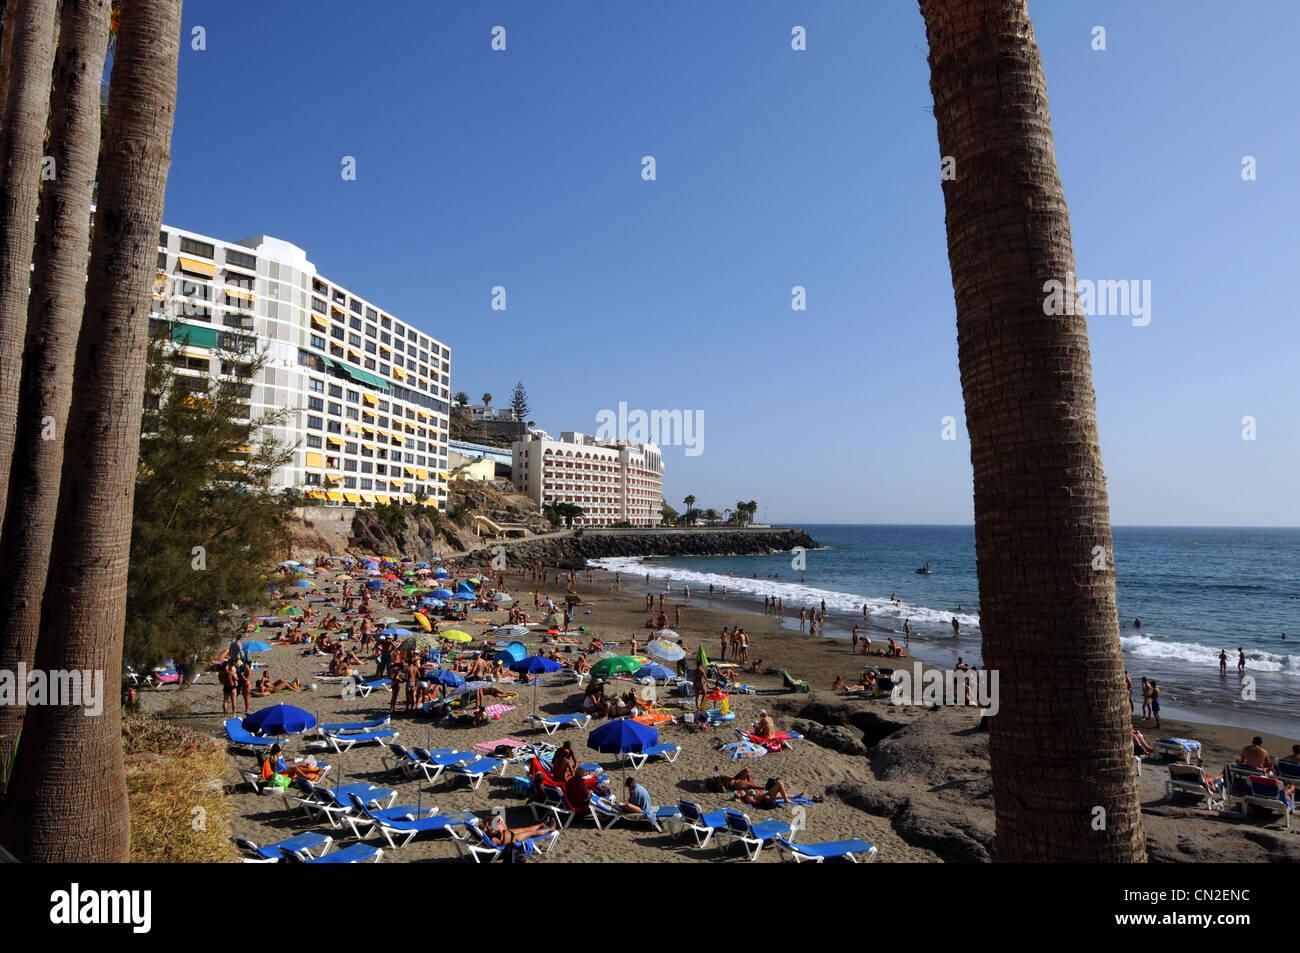 Beach and apartments near Anfi Del Mar Resort, Gran Canaria, Canary Islands - Stock Image